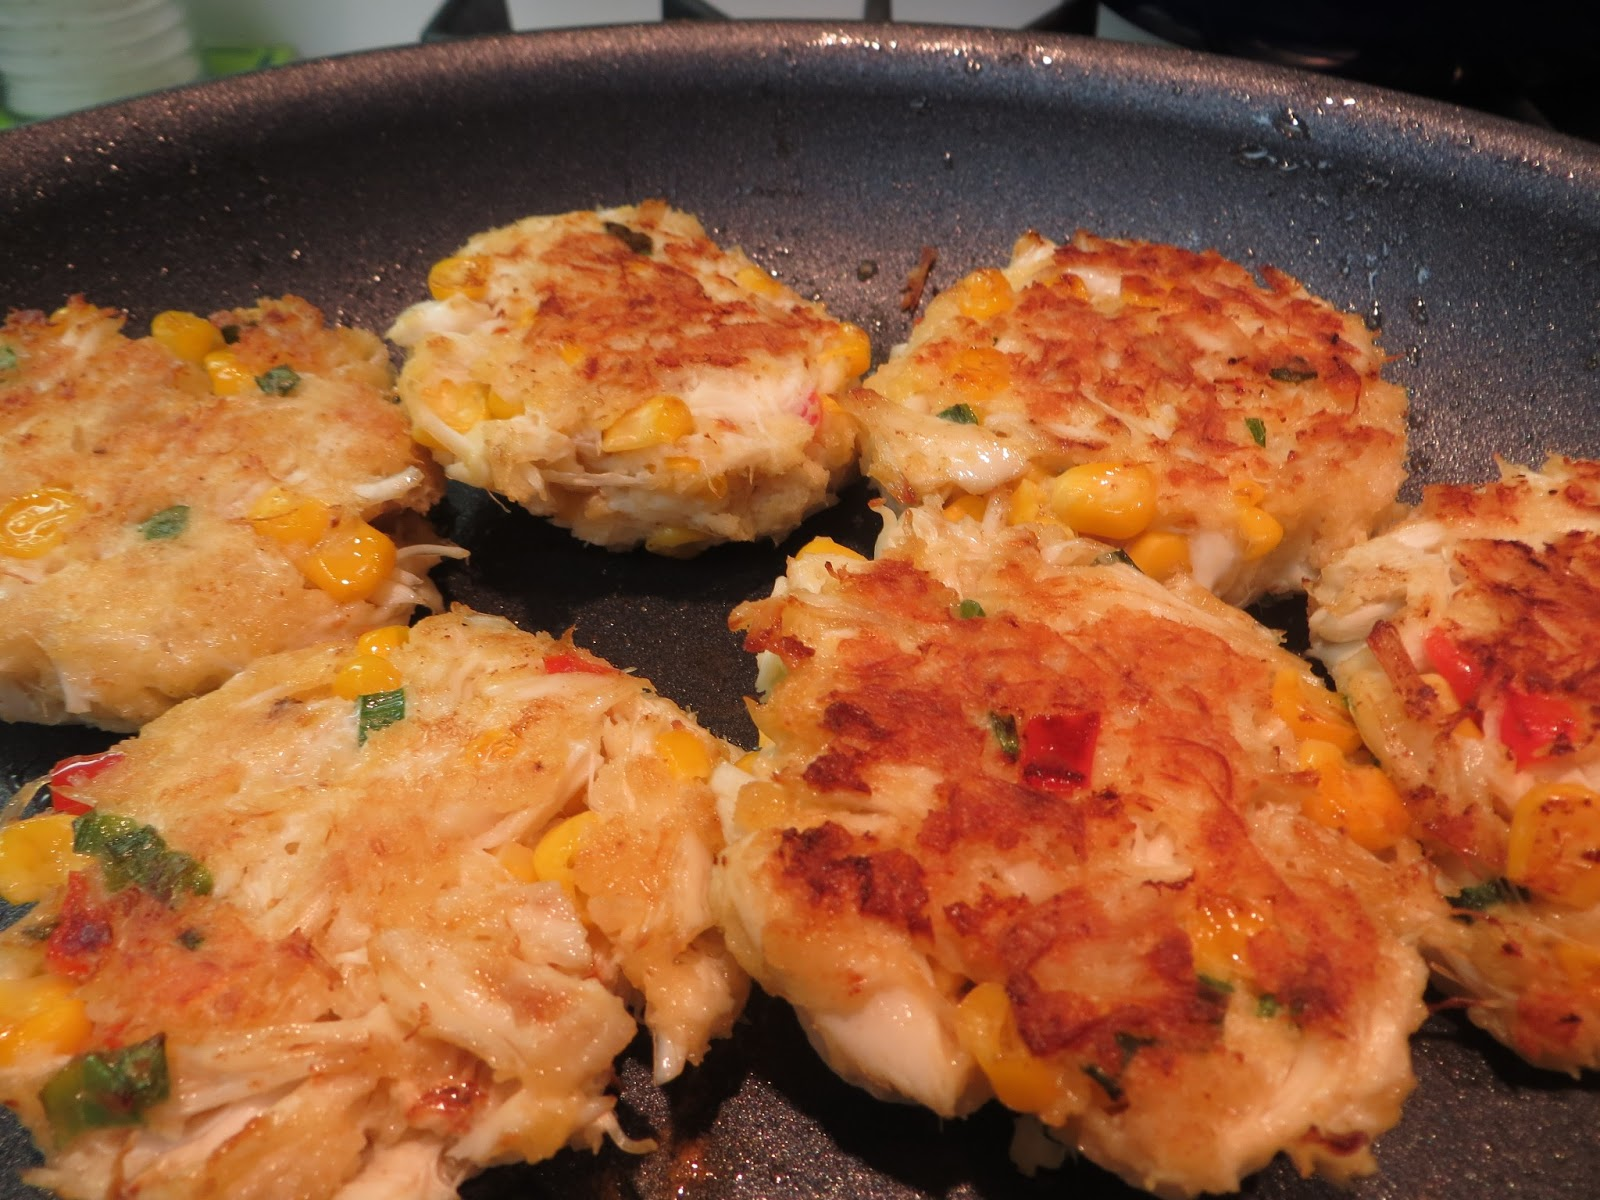 Delicious Adventures Serious Eats J Kenji Lopez Alt S The Best Crab Cakes